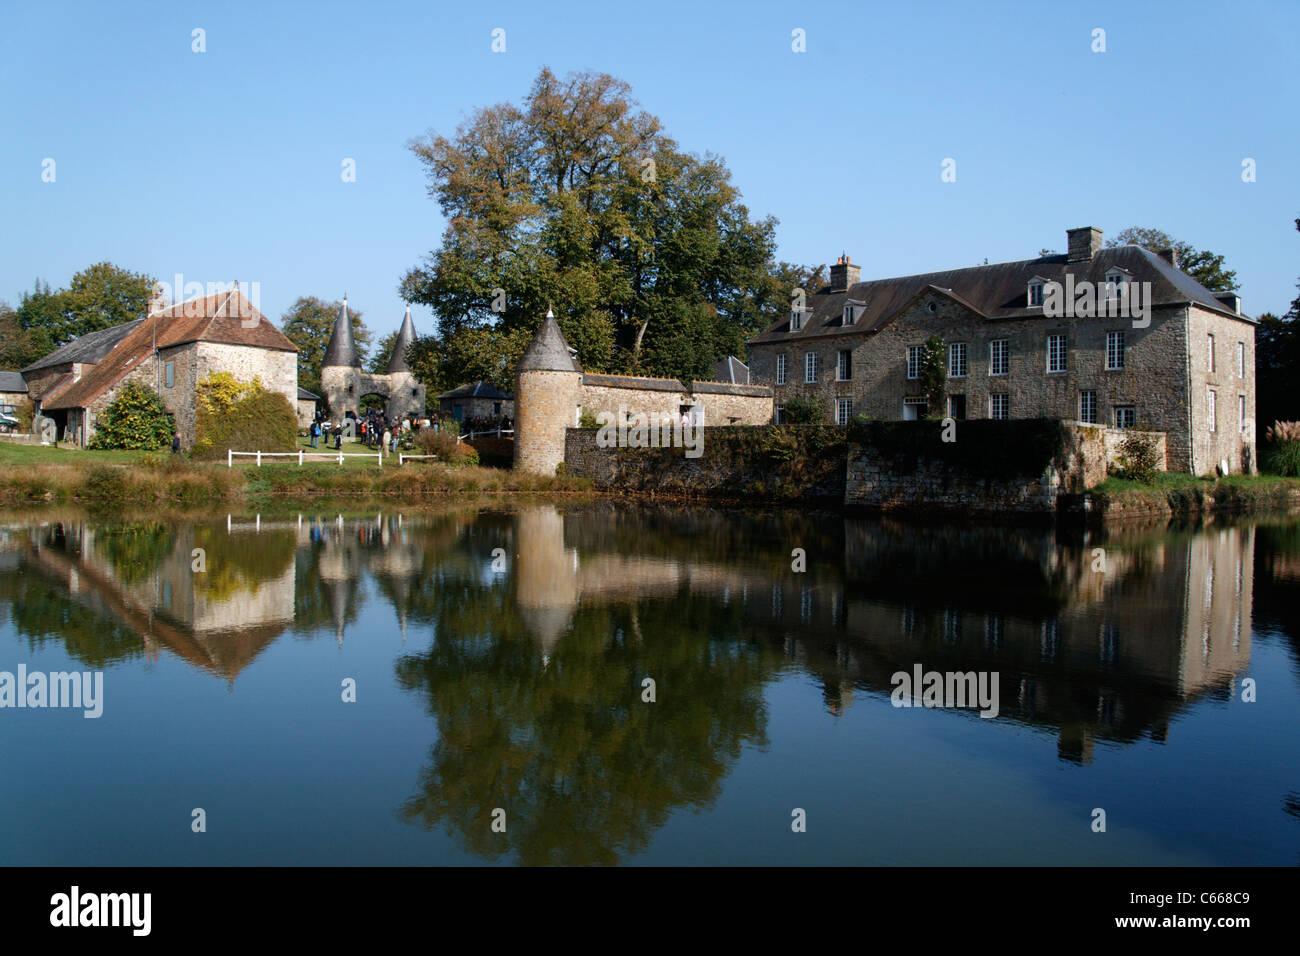 Manor of Guyardière (La Haute Chapelle, Orne, Normandy, France). - Stock Image